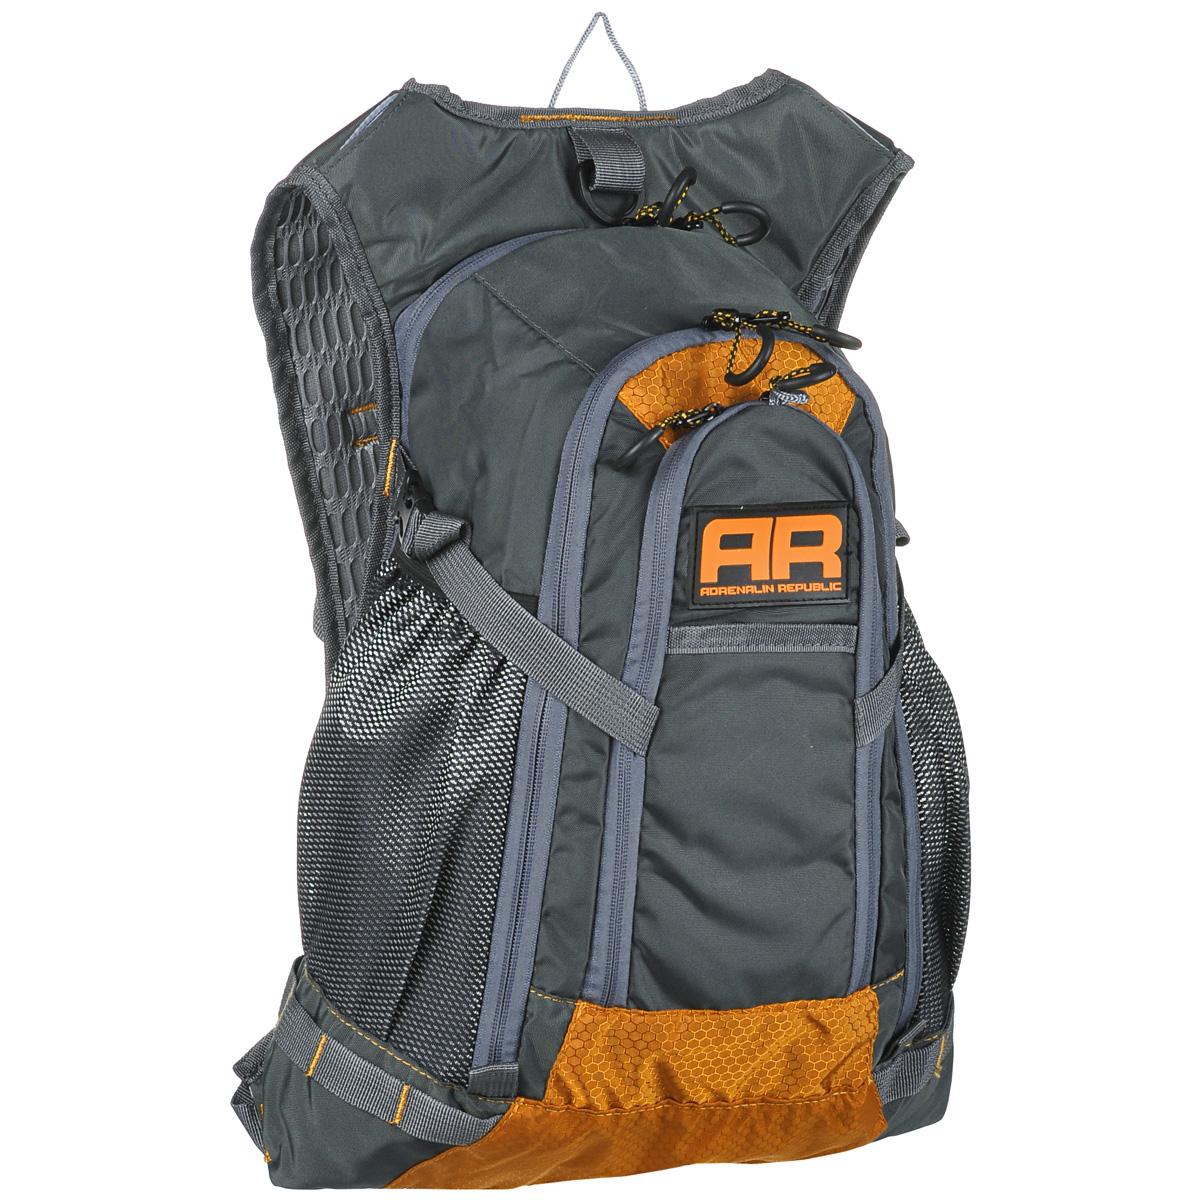 Рюкзак Adrenalin Republic Backpack L, цвет: оранжевый, серый, 25 л